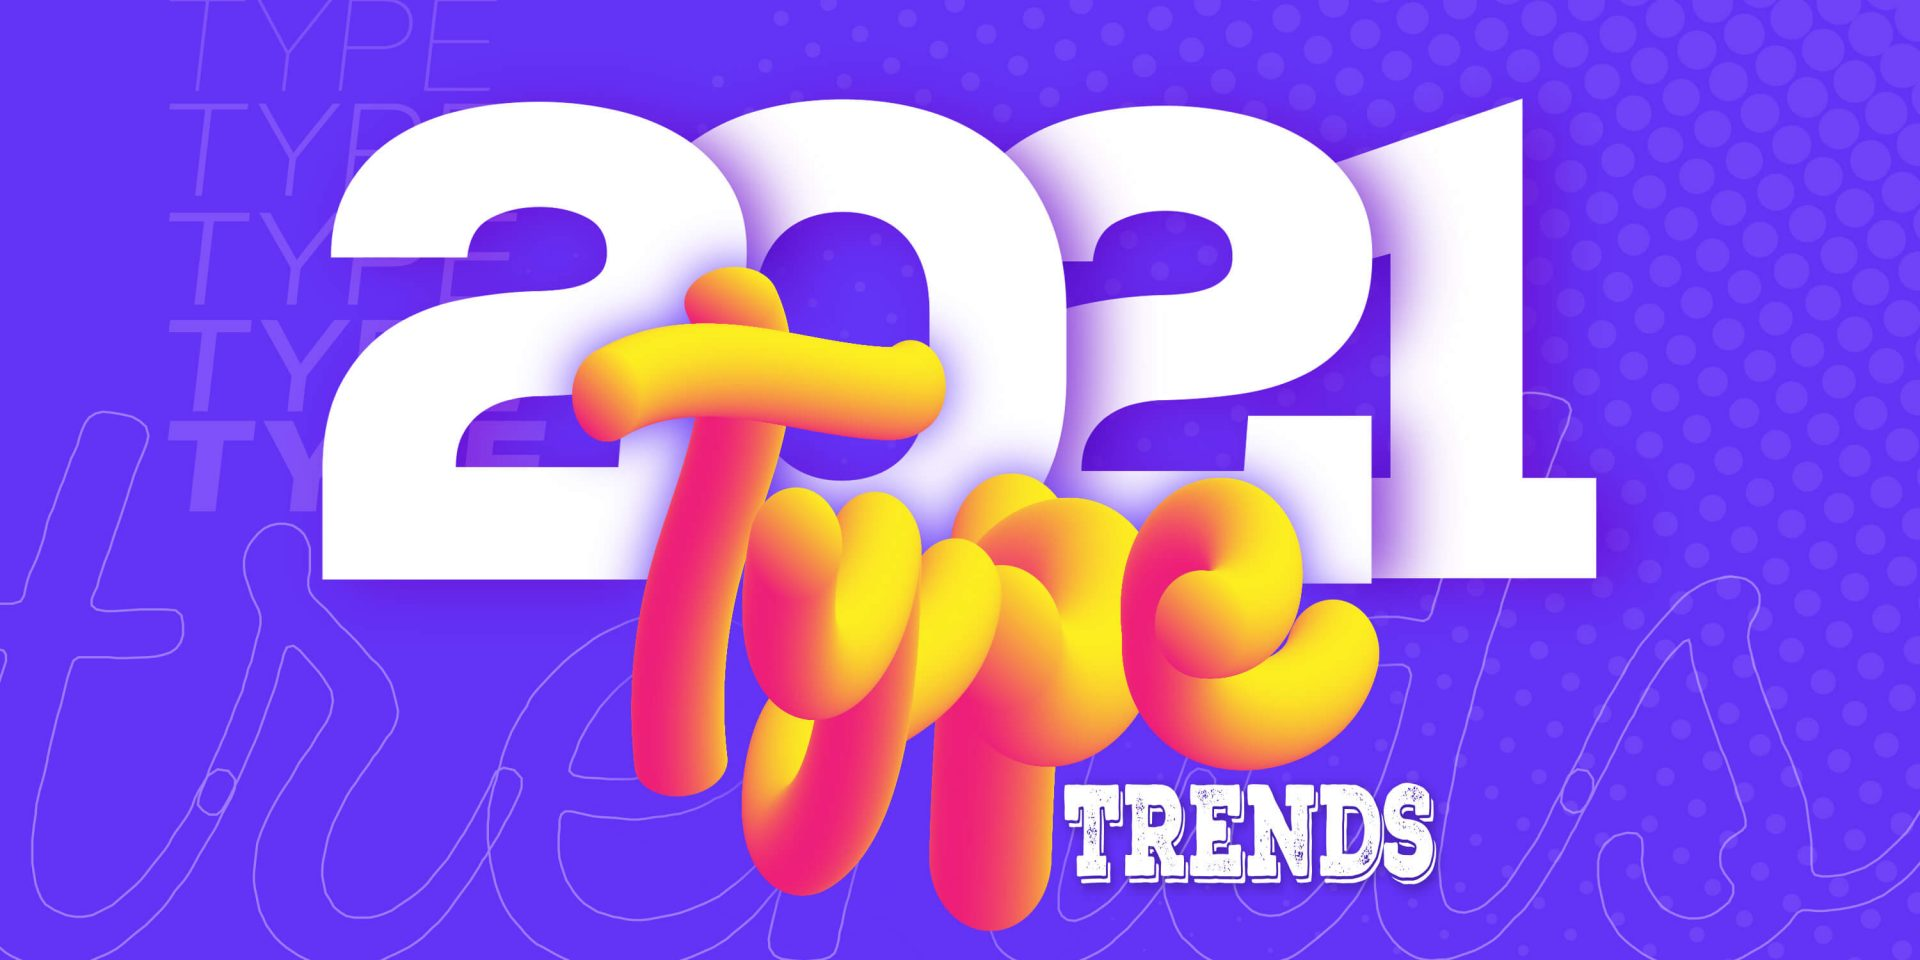 Typography Trends 2021 image